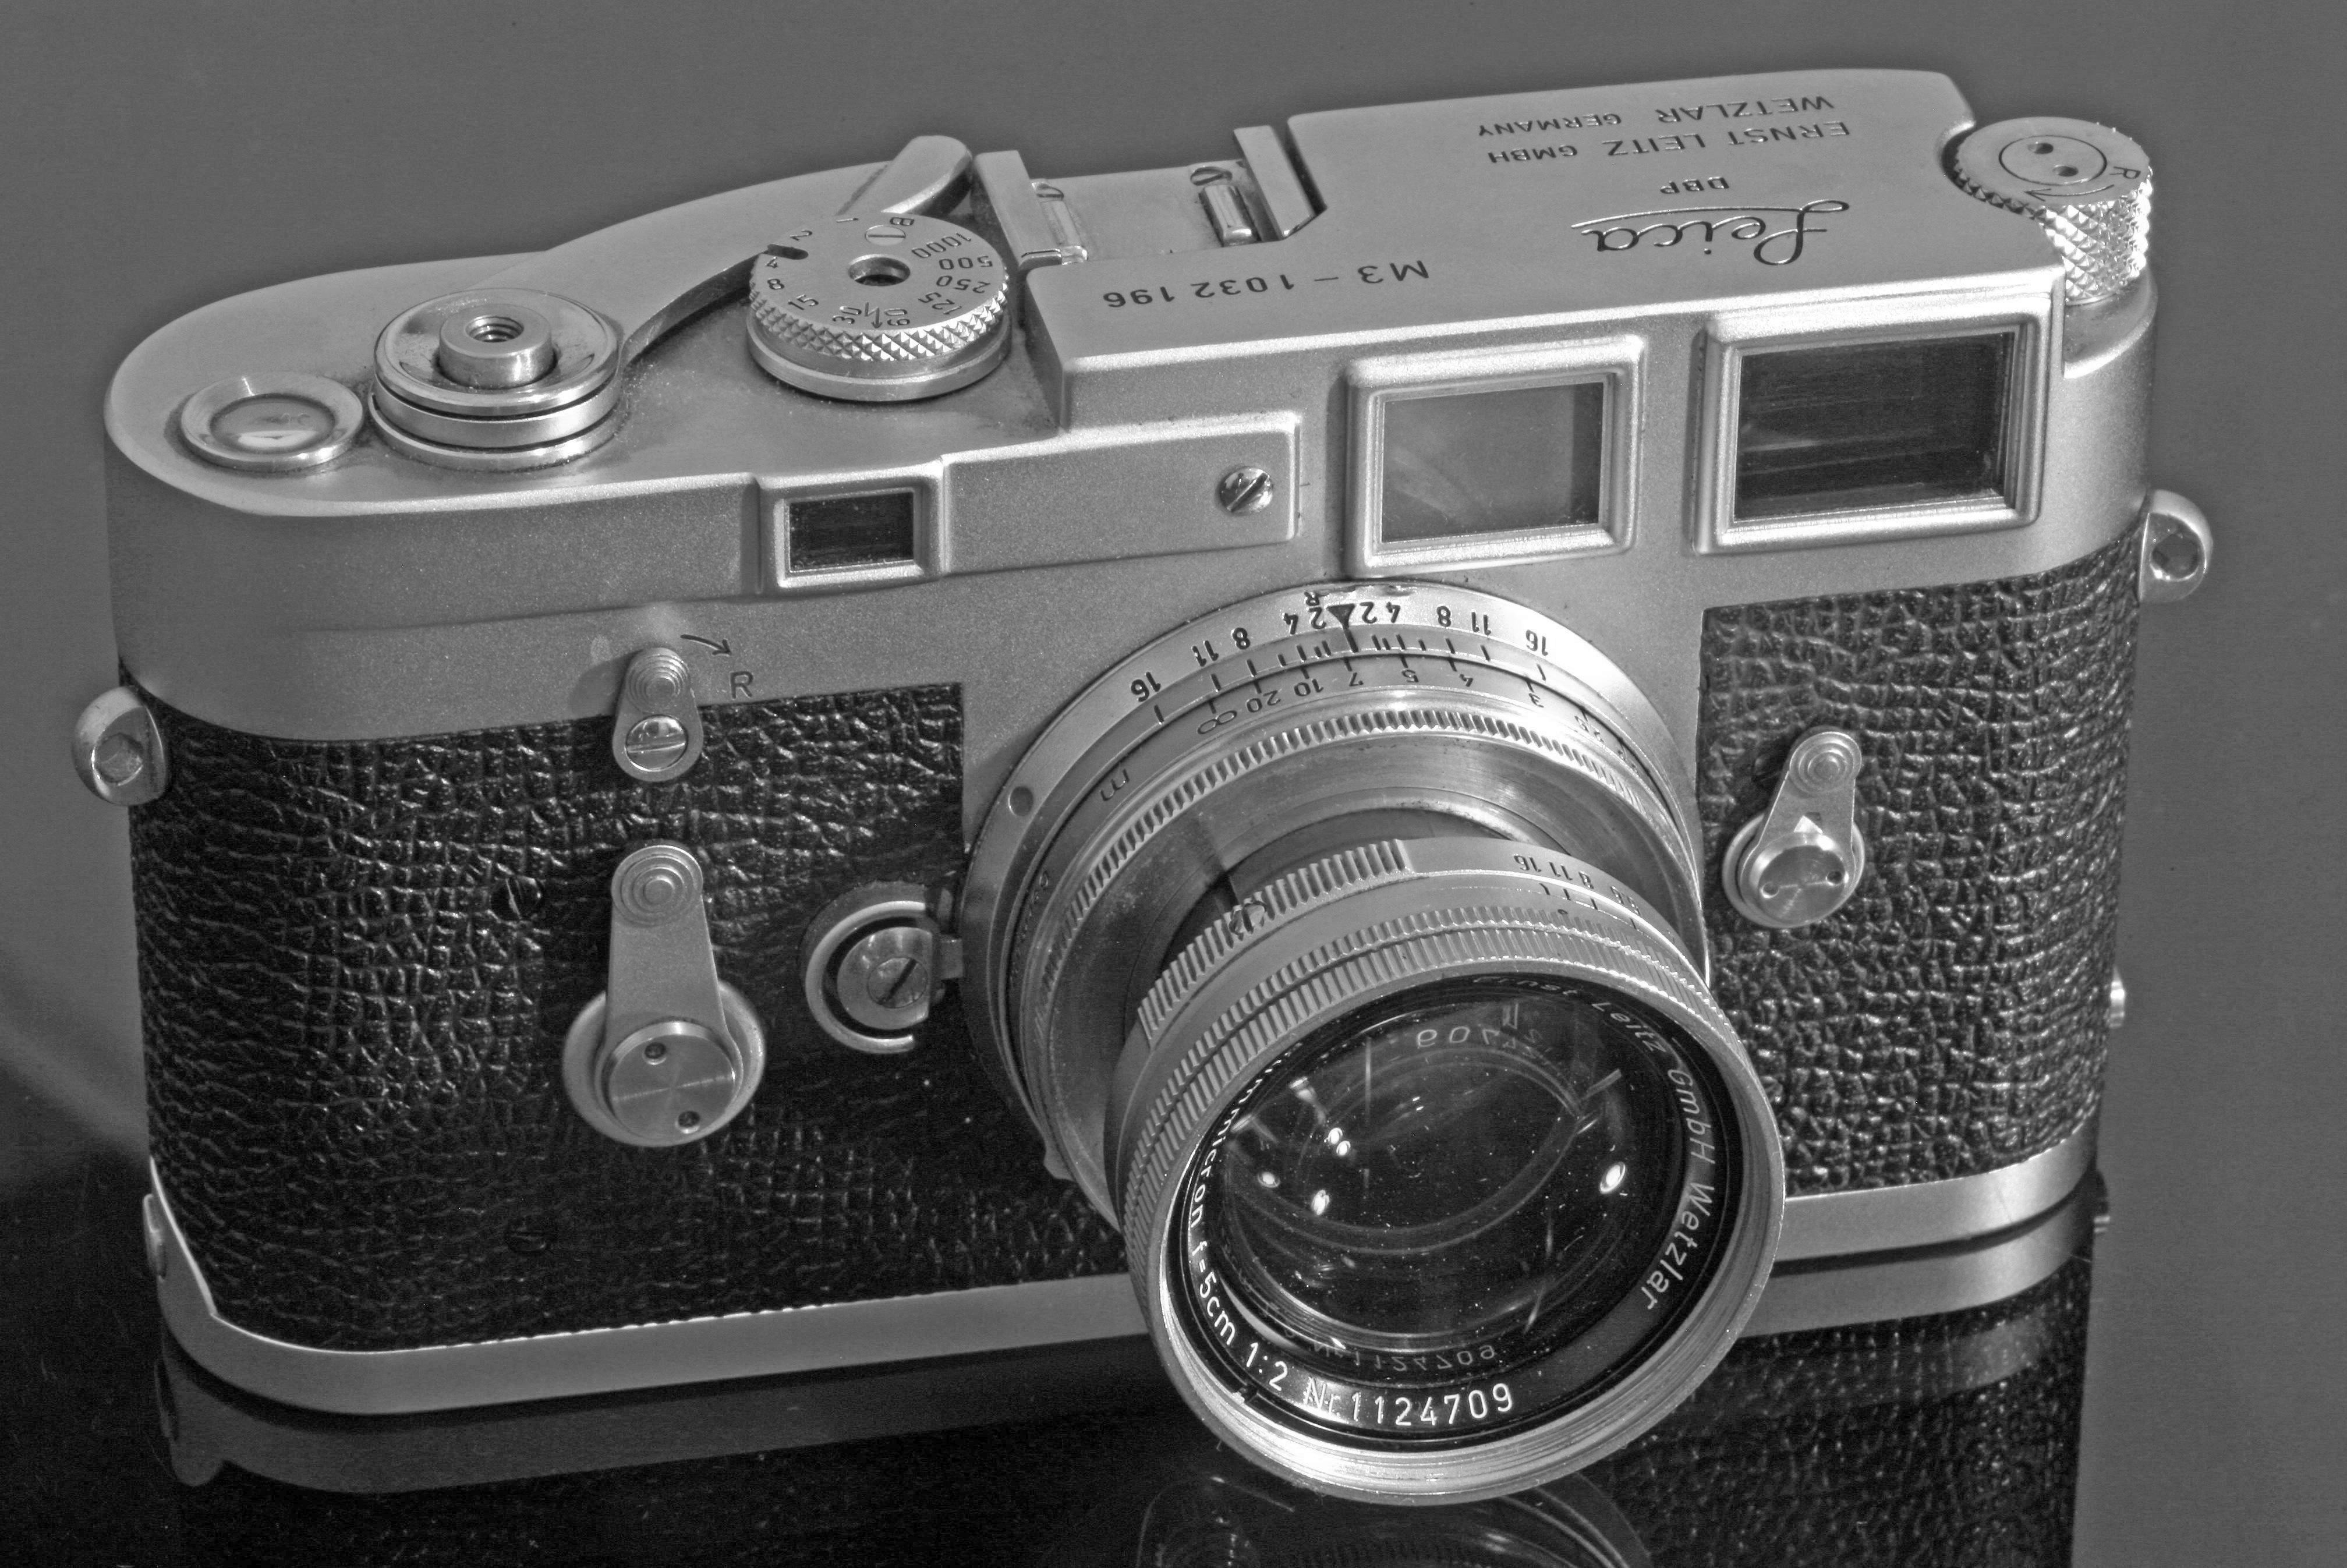 Leica M6 Entfernungsmesser Justieren : Leica m u wikipedia